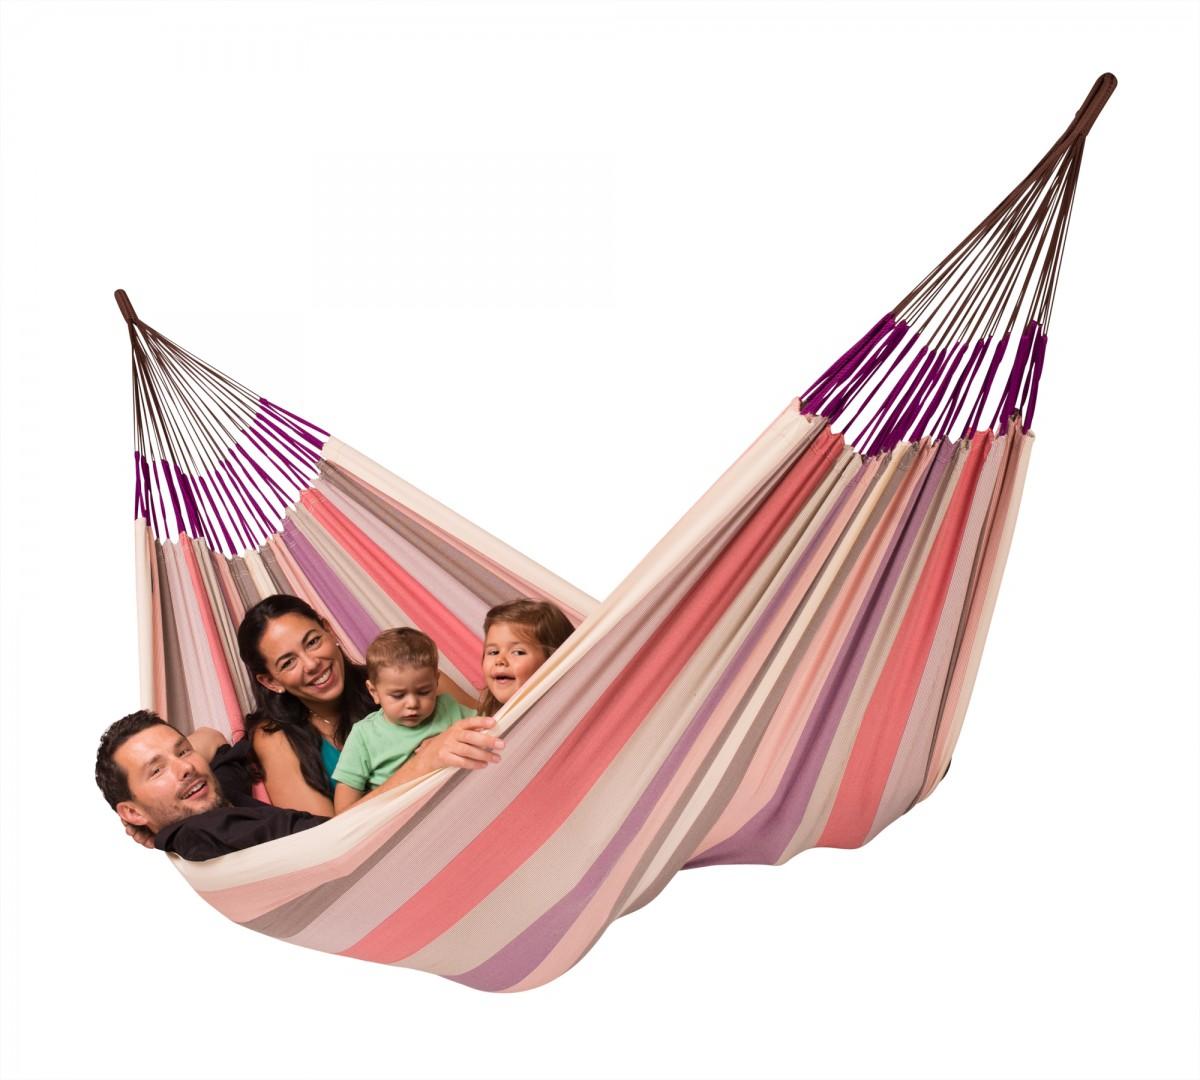 AMACA LA SIESTA DOMINGO PLUM (FAMILY)